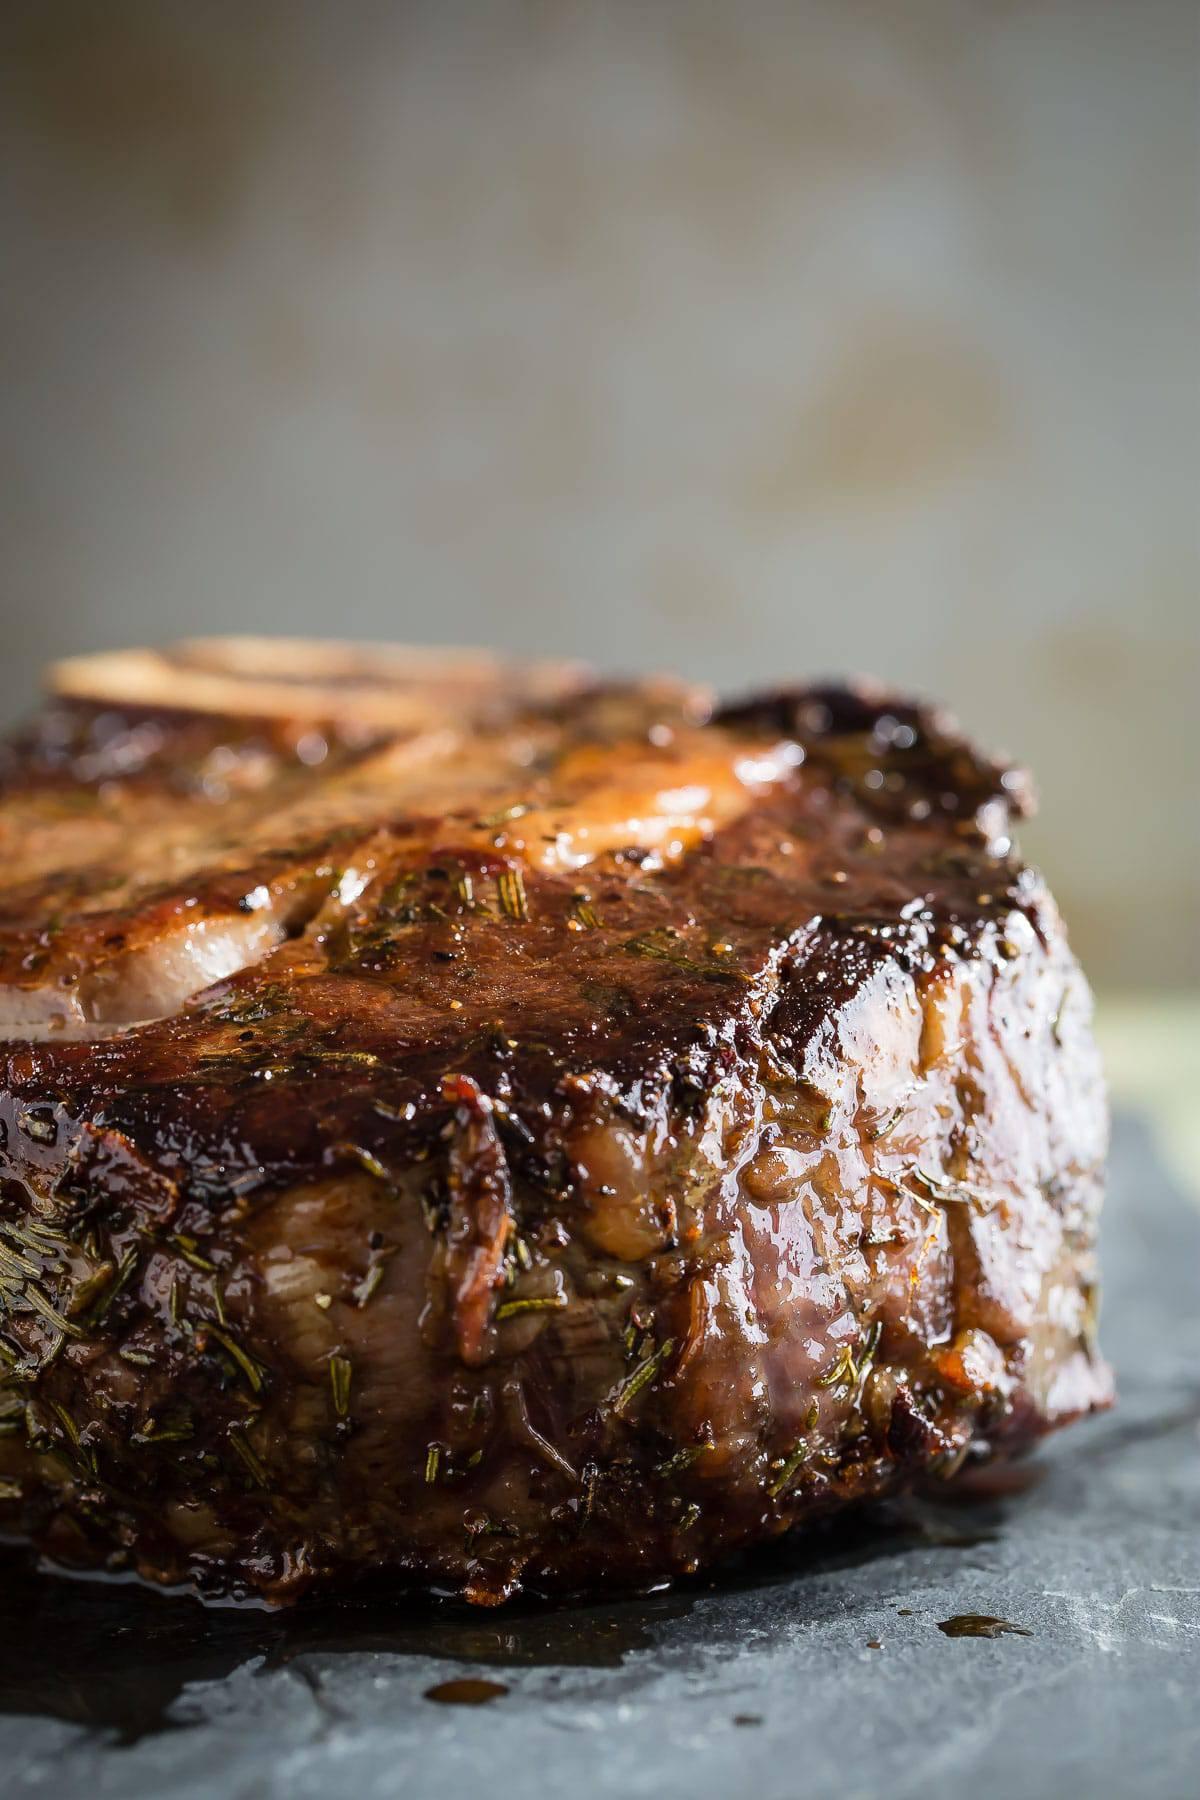 The biggest juiciest ribeye steak covered in fresh rosemary, sea salt and cracked black pepper